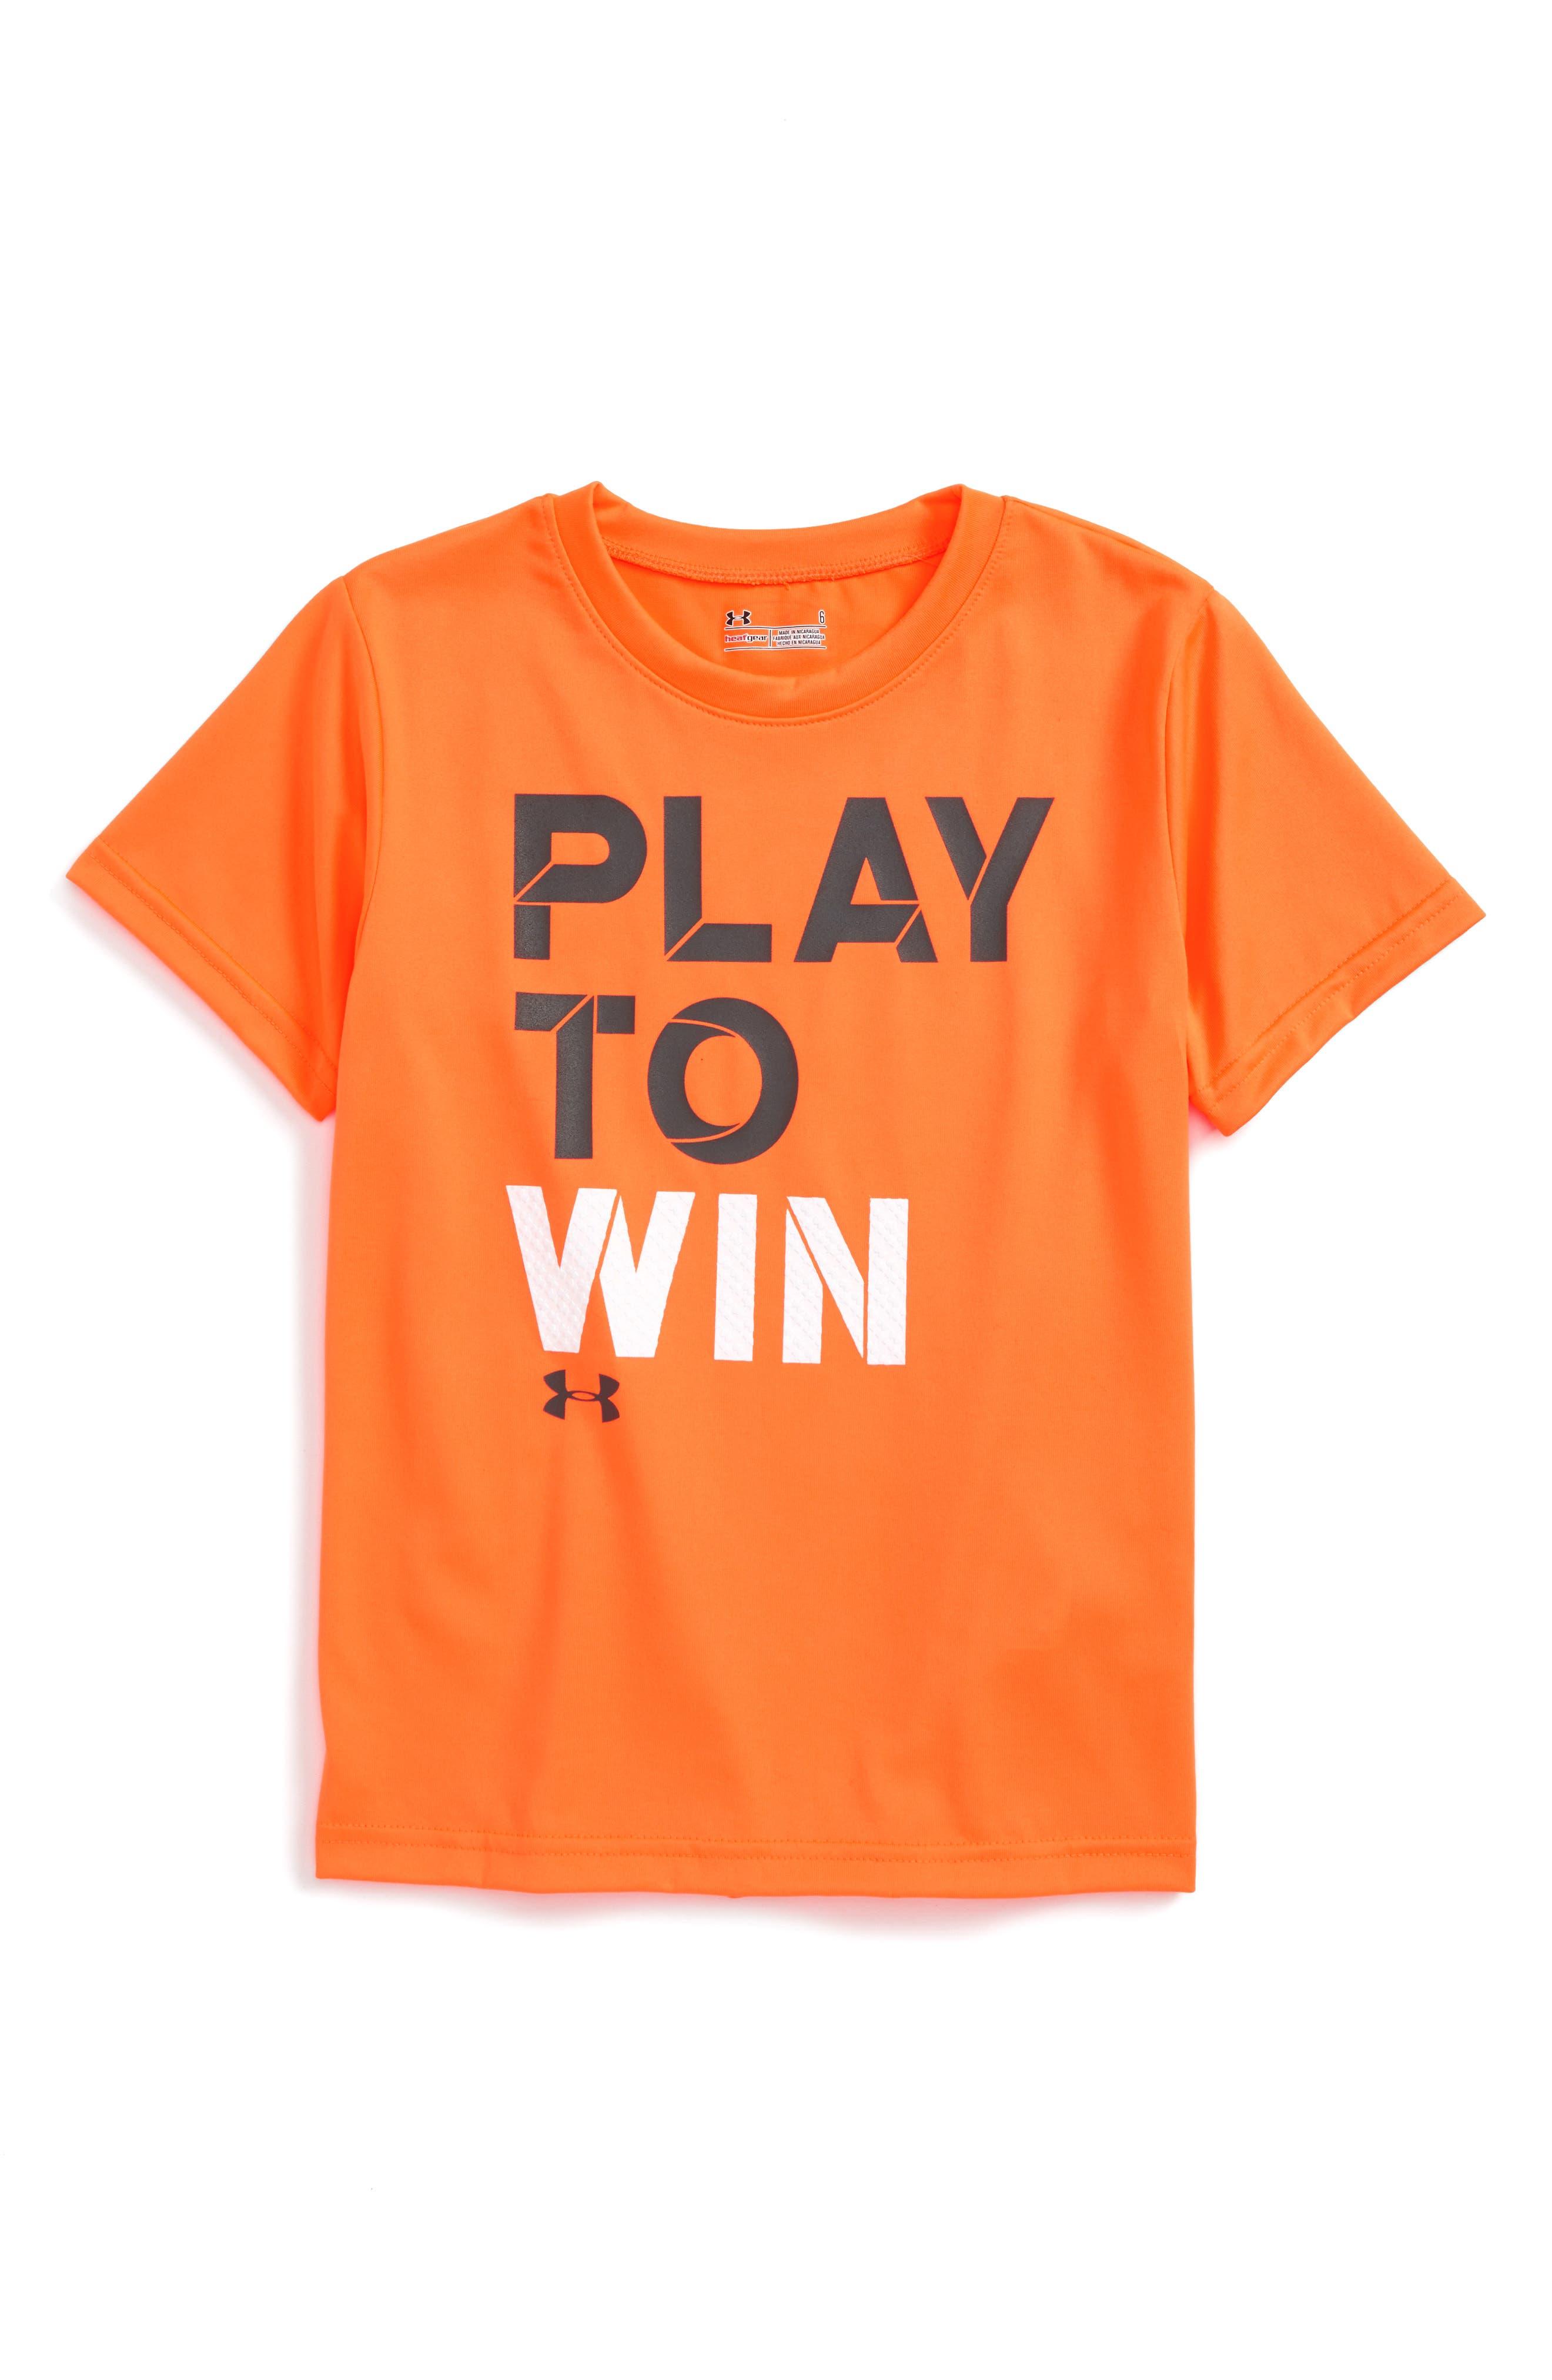 Under Armour Play to Win HeatGear® T-Shirt (Toddler Boys & Little Boys)